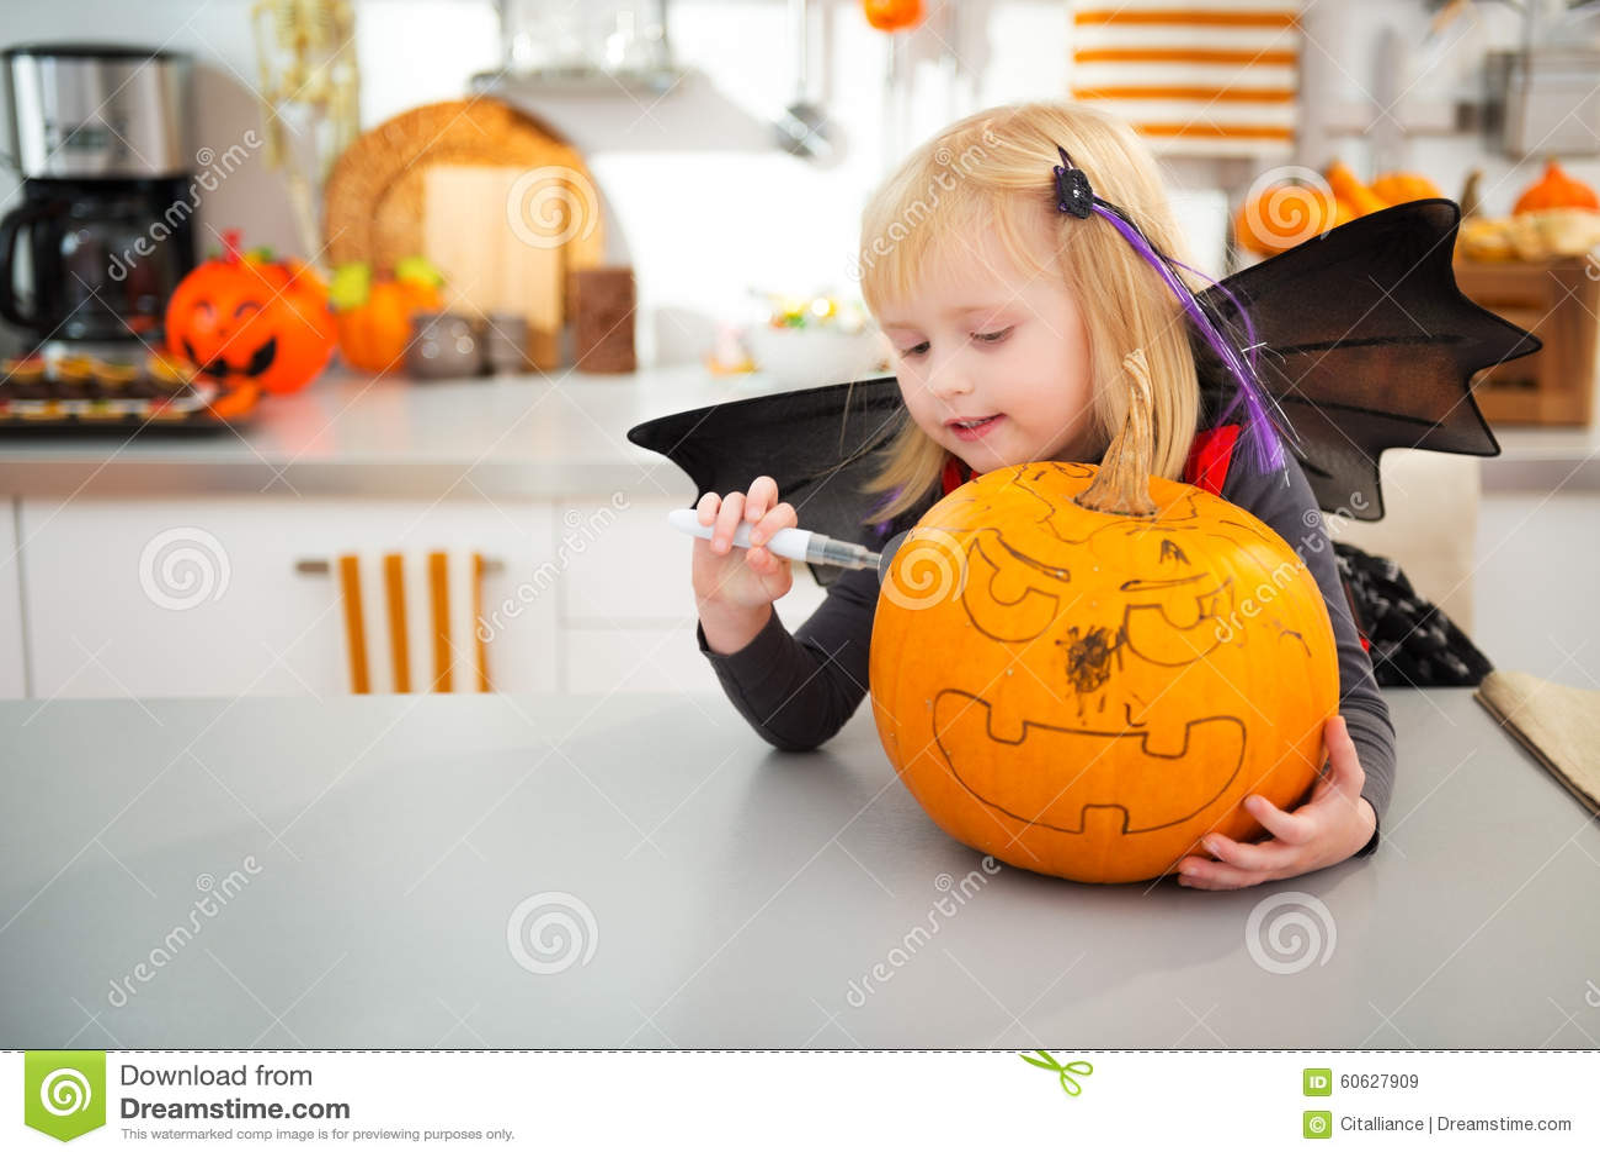 kitchen lanterns island design 万圣夜打扮了创造大南瓜杰克o灯笼的女孩库存图片 图片包括有现代 厨房 微笑的万圣夜打扮了创造大橙色南瓜杰克o灯笼的女孩在装饰的厨房传统秋天假日